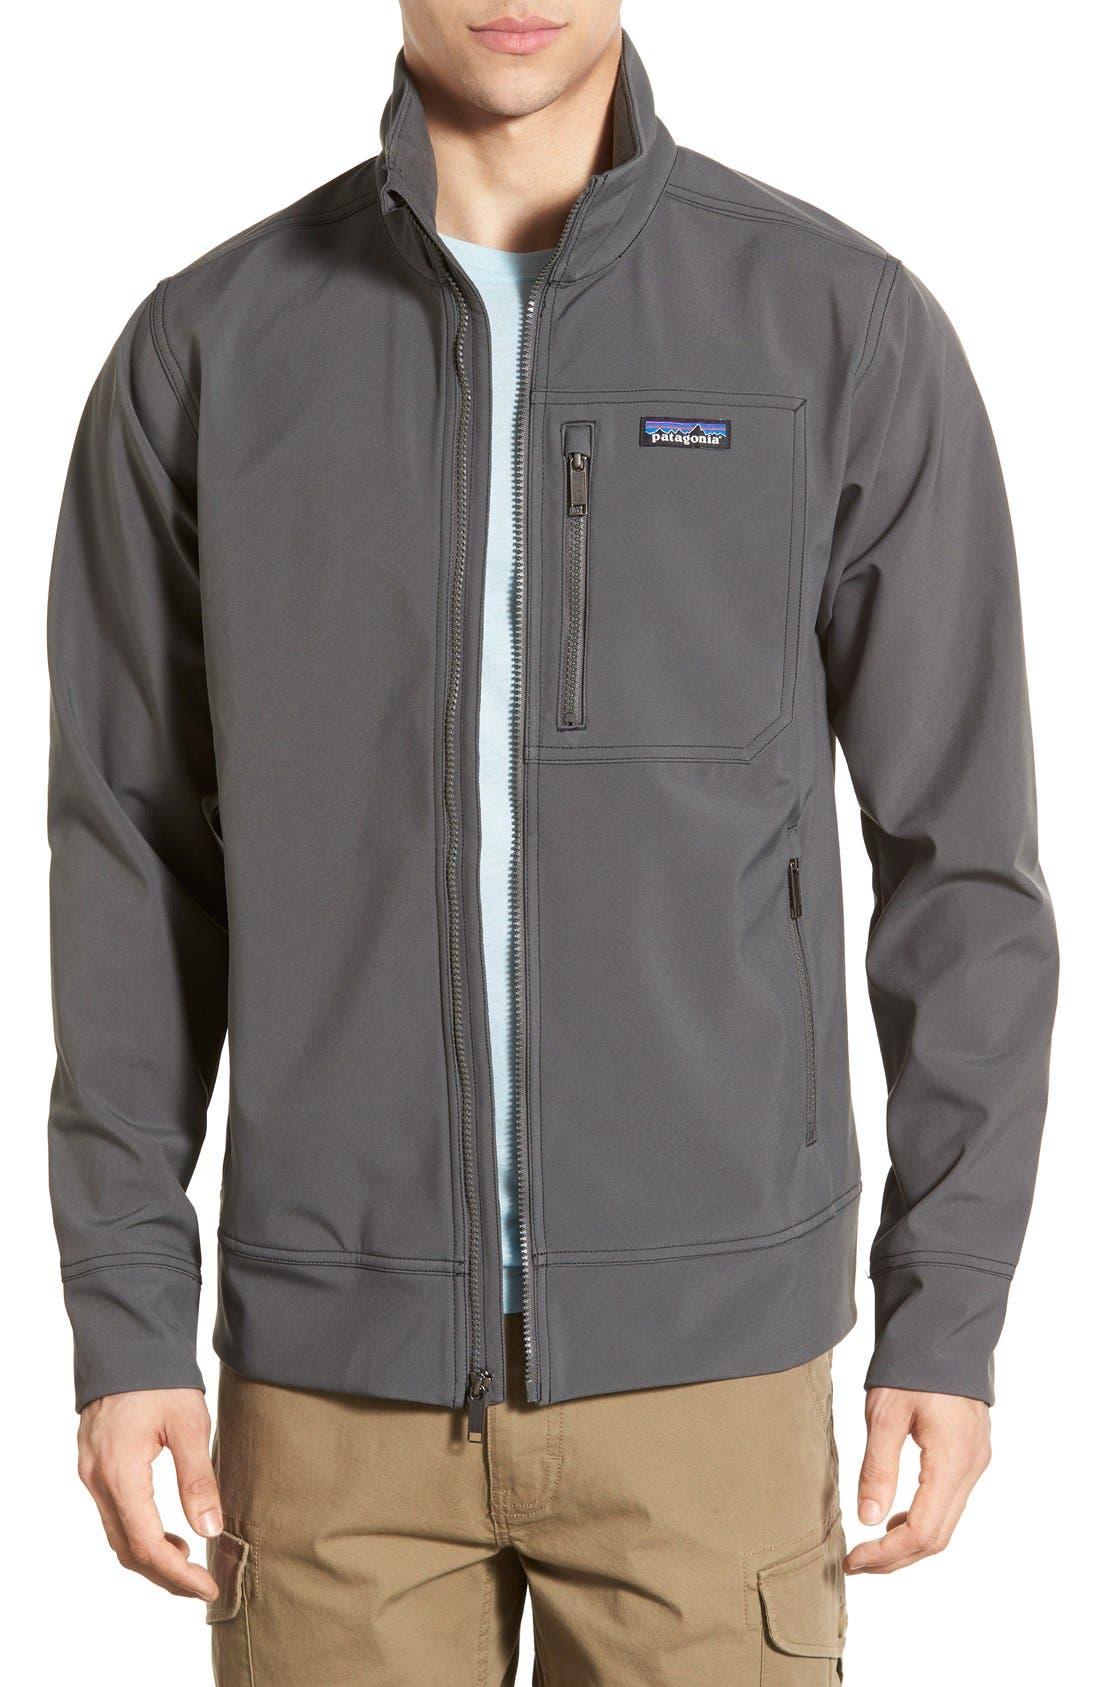 Alternate Image 1 Selected - Patagonia 'Sidesend' Regular Fit Water Repellent Jacket